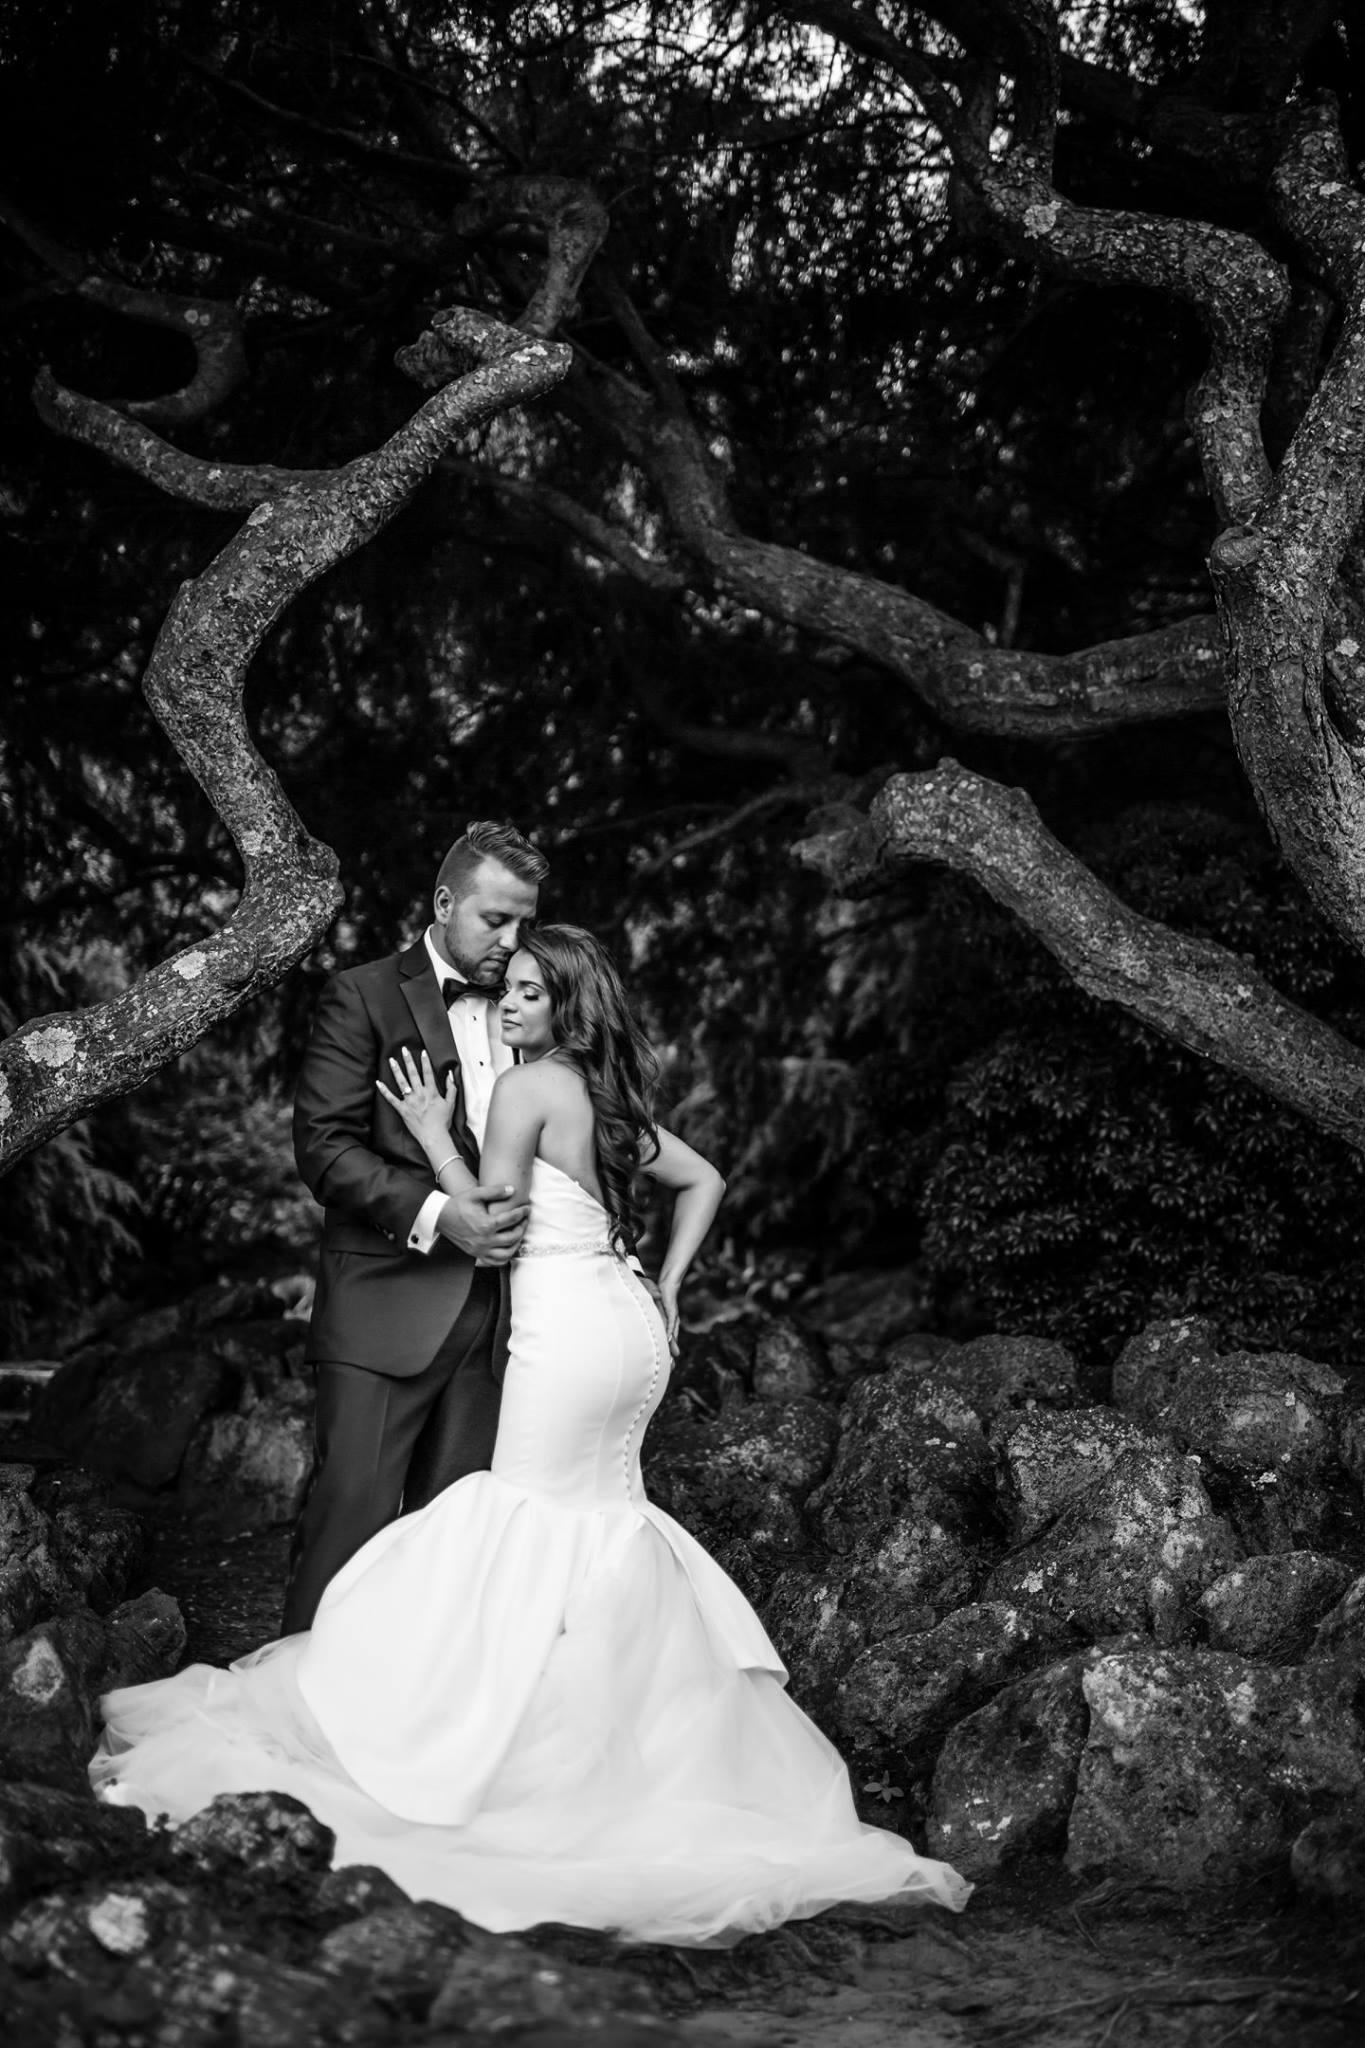 zajac photography wedding 22a